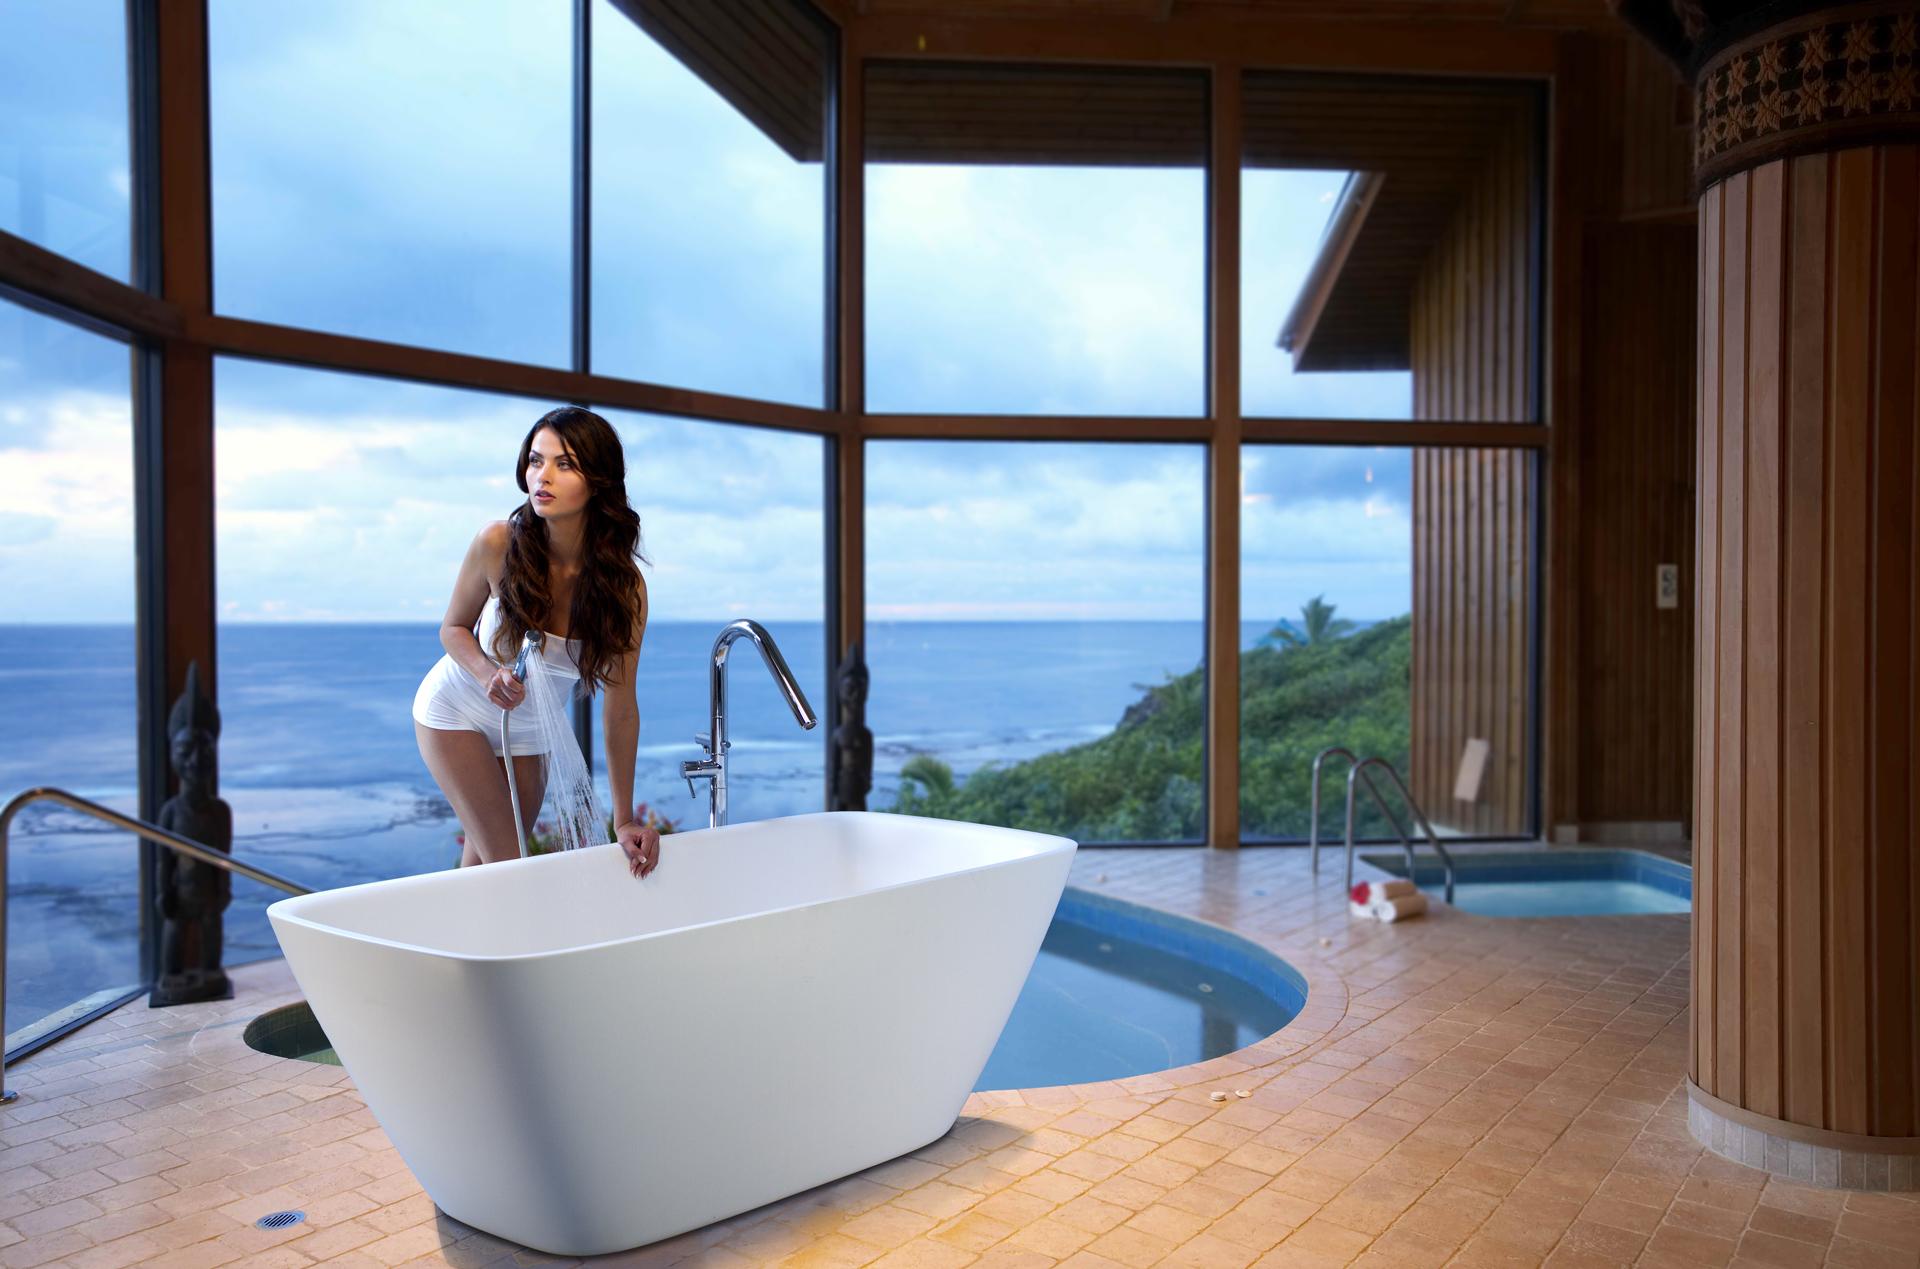 Arabella-wht Freestanding Stone Bath